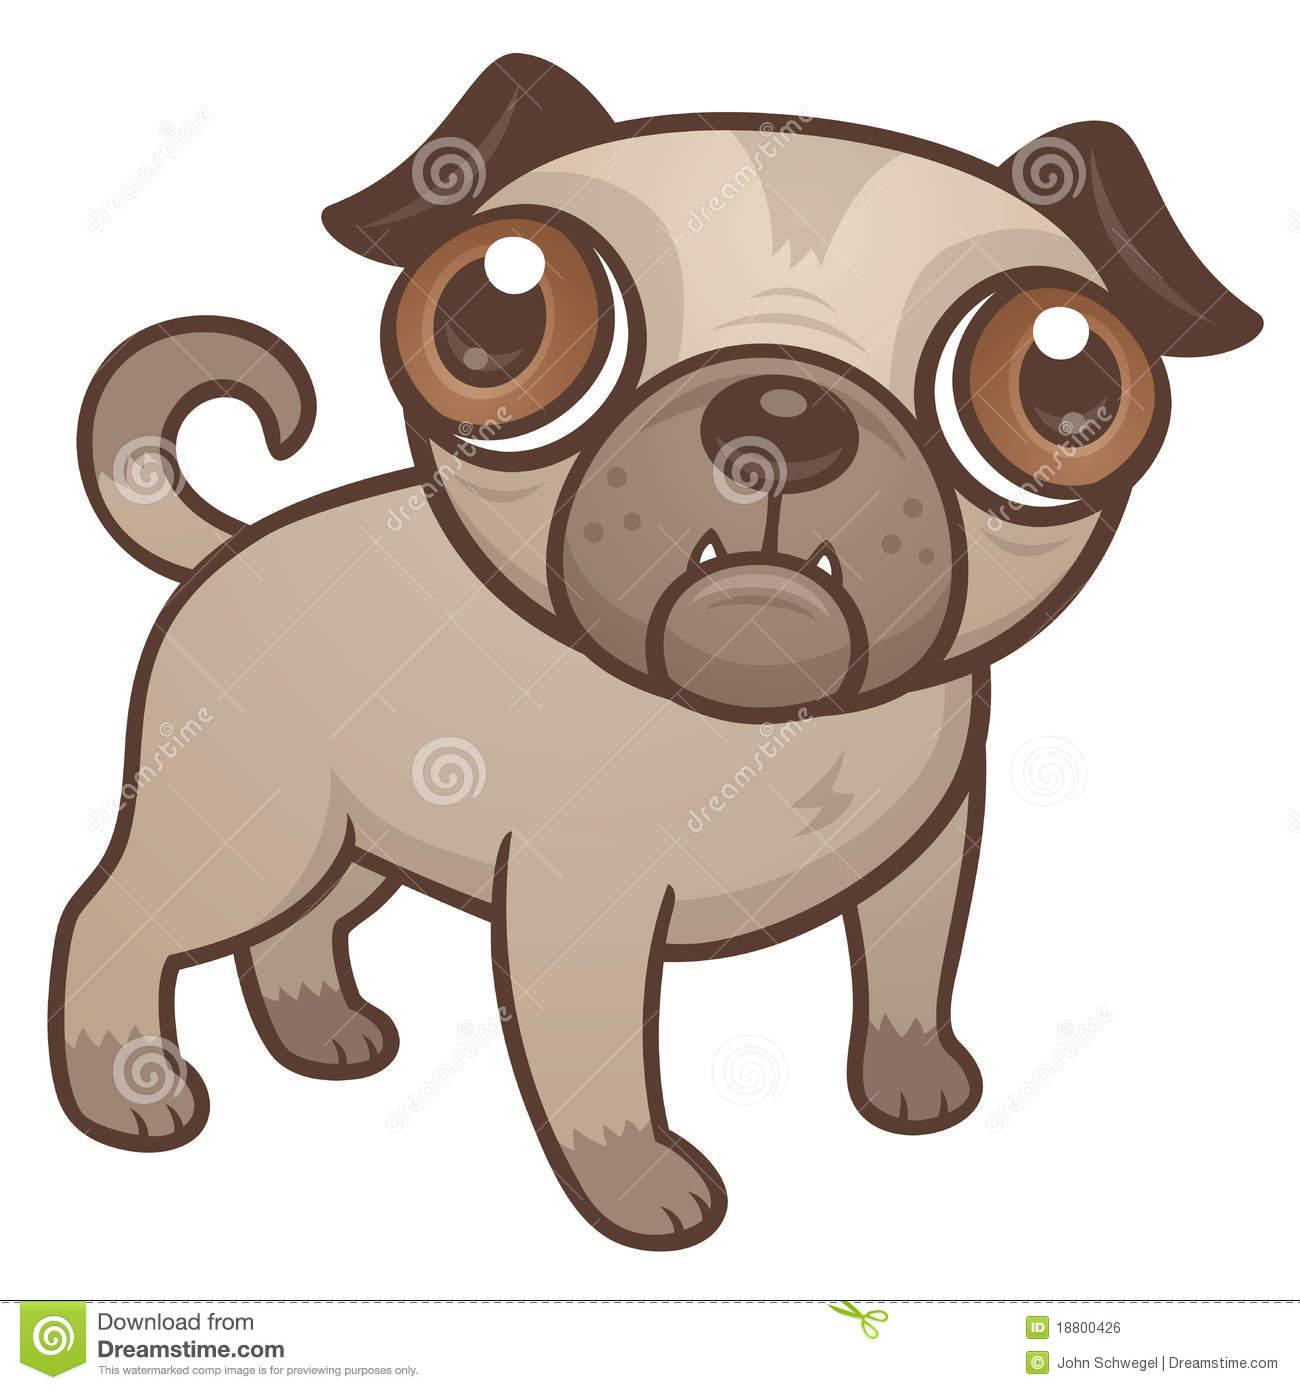 Pug Puppy Cartoon Royalty Free Stock Ima-Pug Puppy Cartoon Royalty Free Stock Image-19